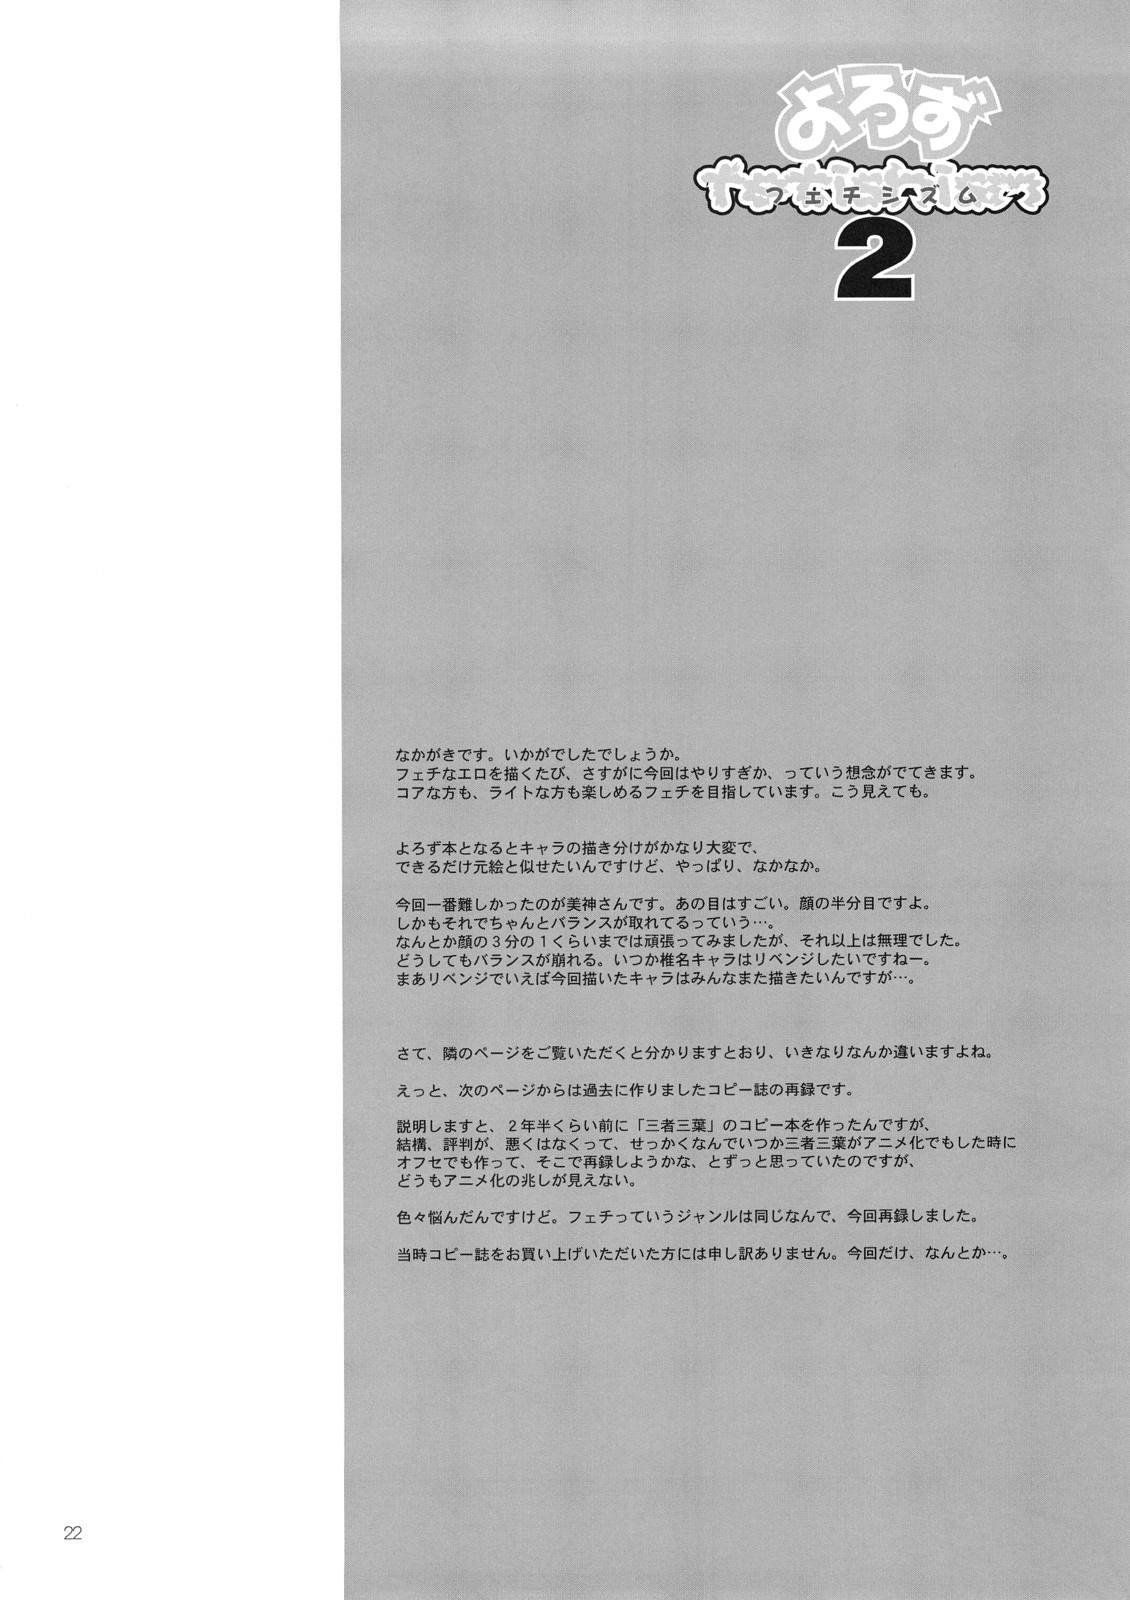 Yorozu fetishism 2 20